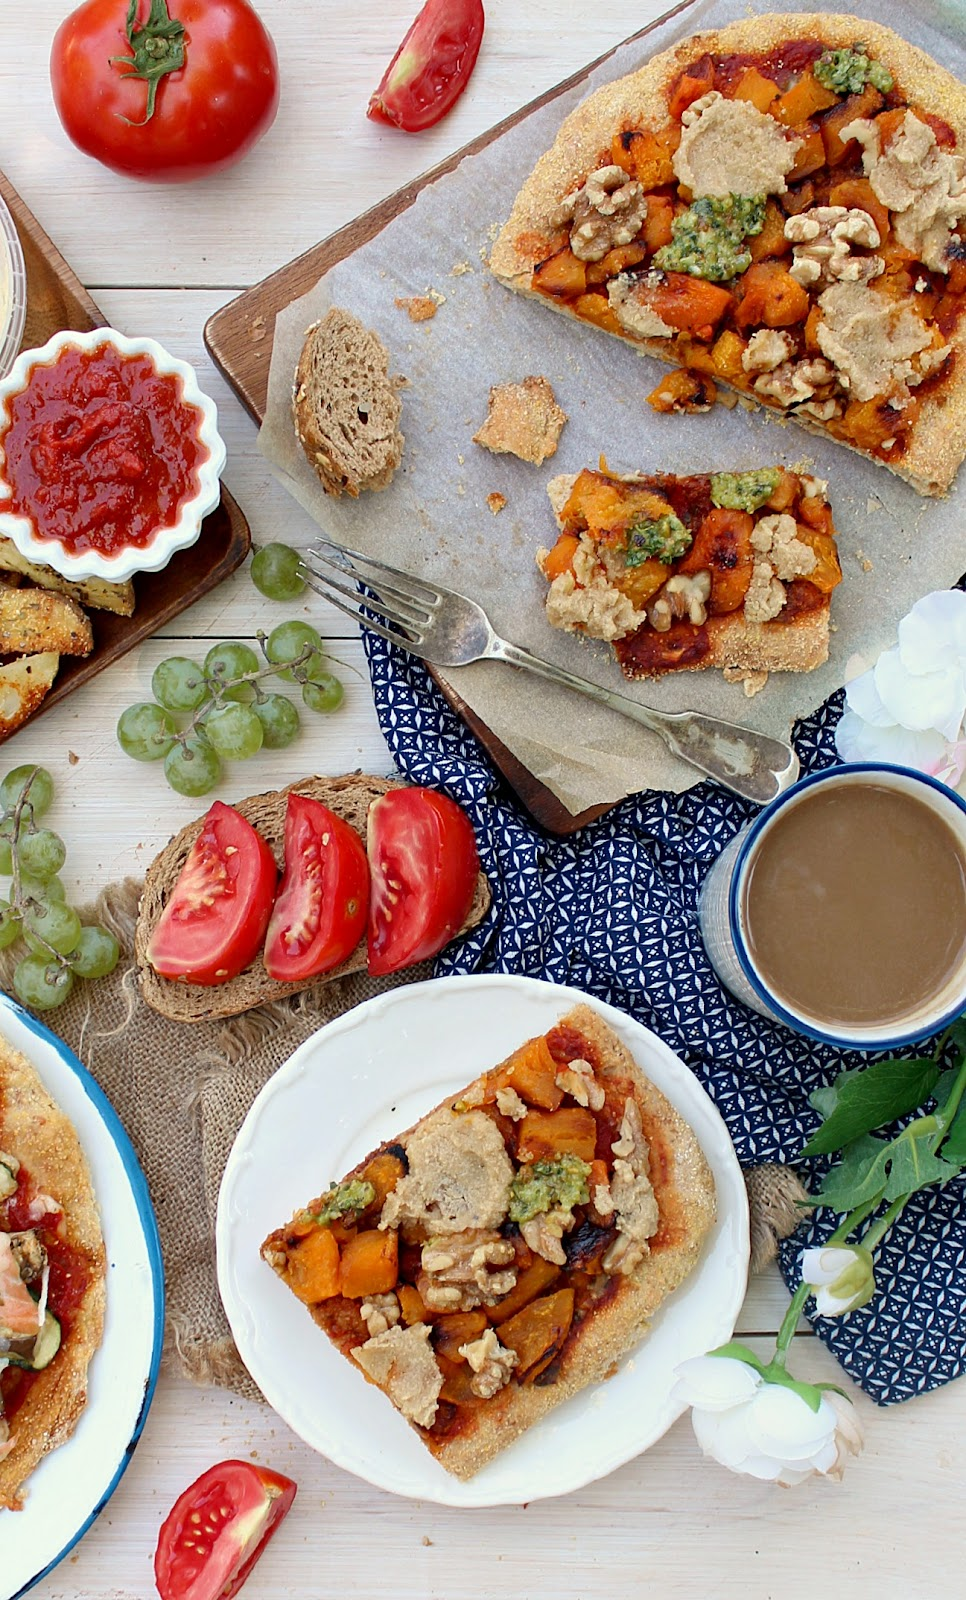 Vegan Butternut Squash, Pesto and Walnut Pizza with Garlic Cashew Cheese